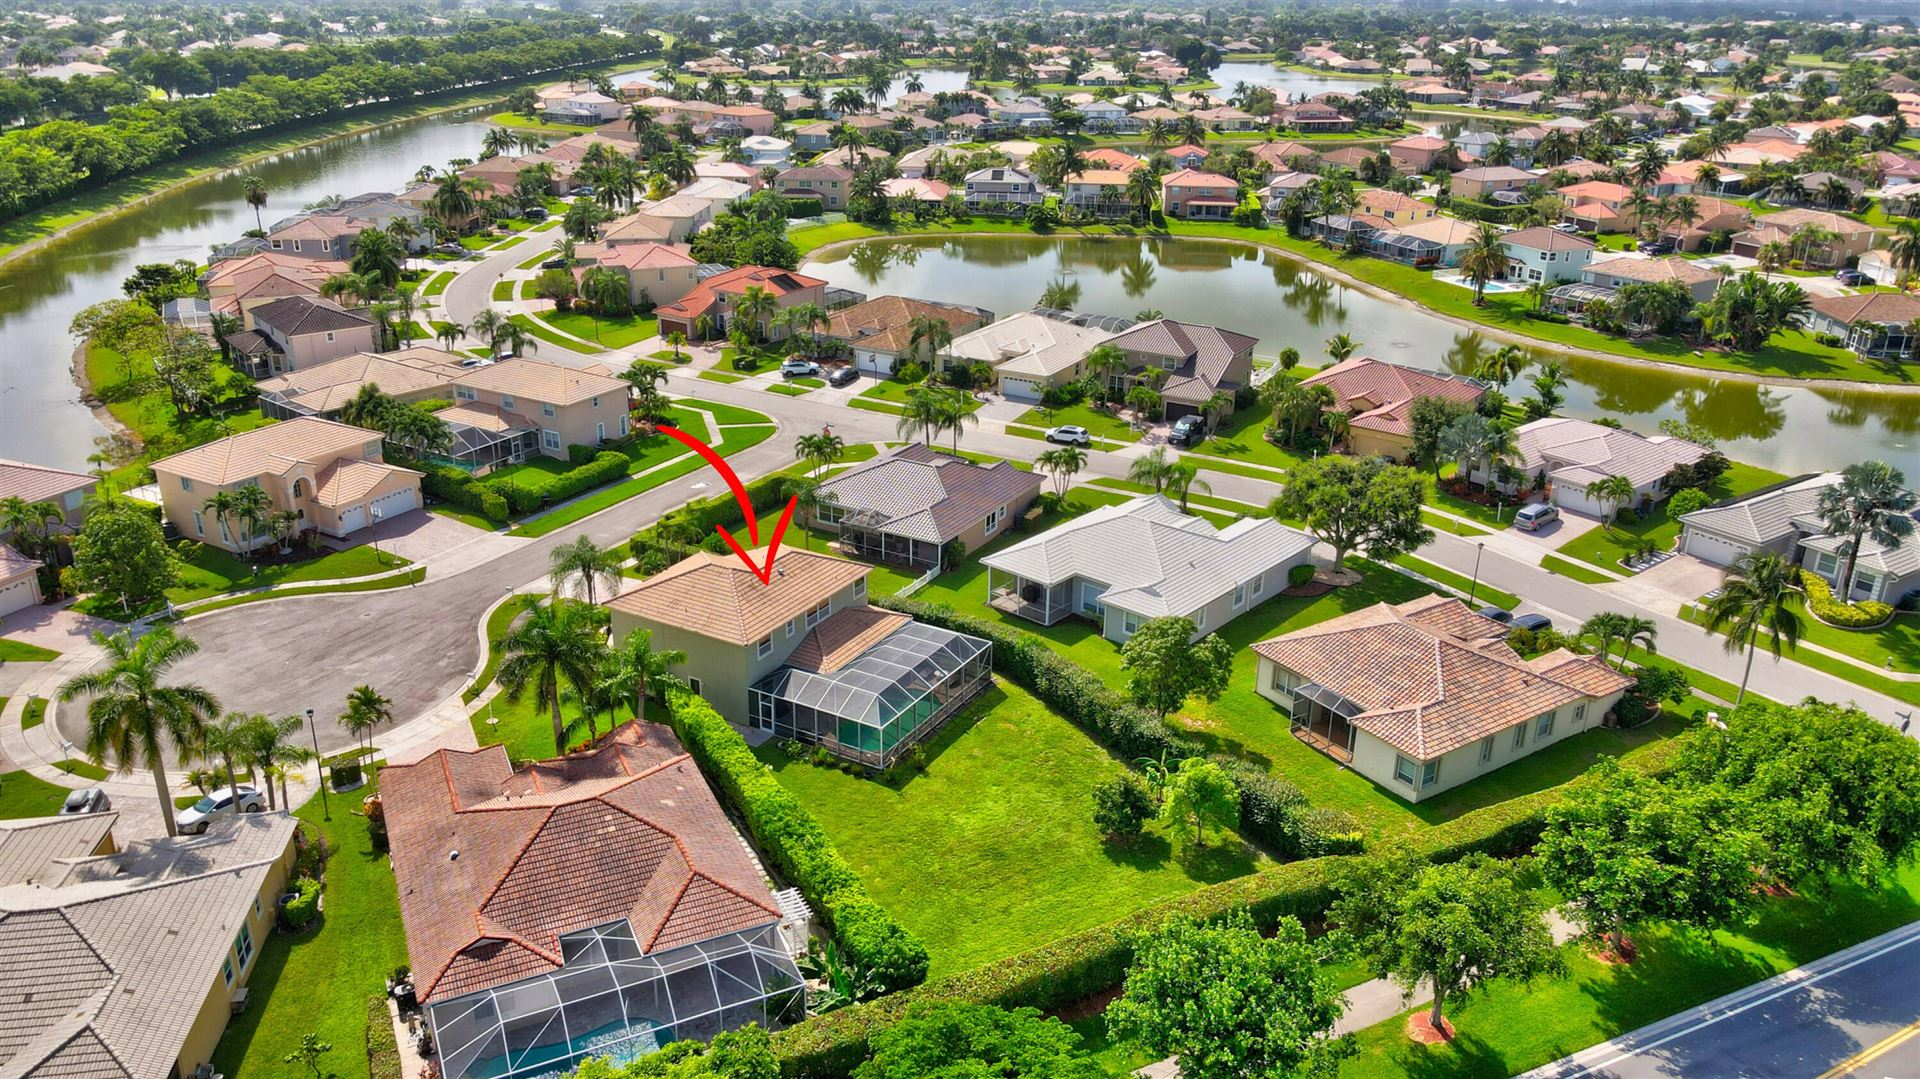 Photo of 21799 Sugarberry Circle, Boca Raton, FL 33428 (MLS # RX-10725285)